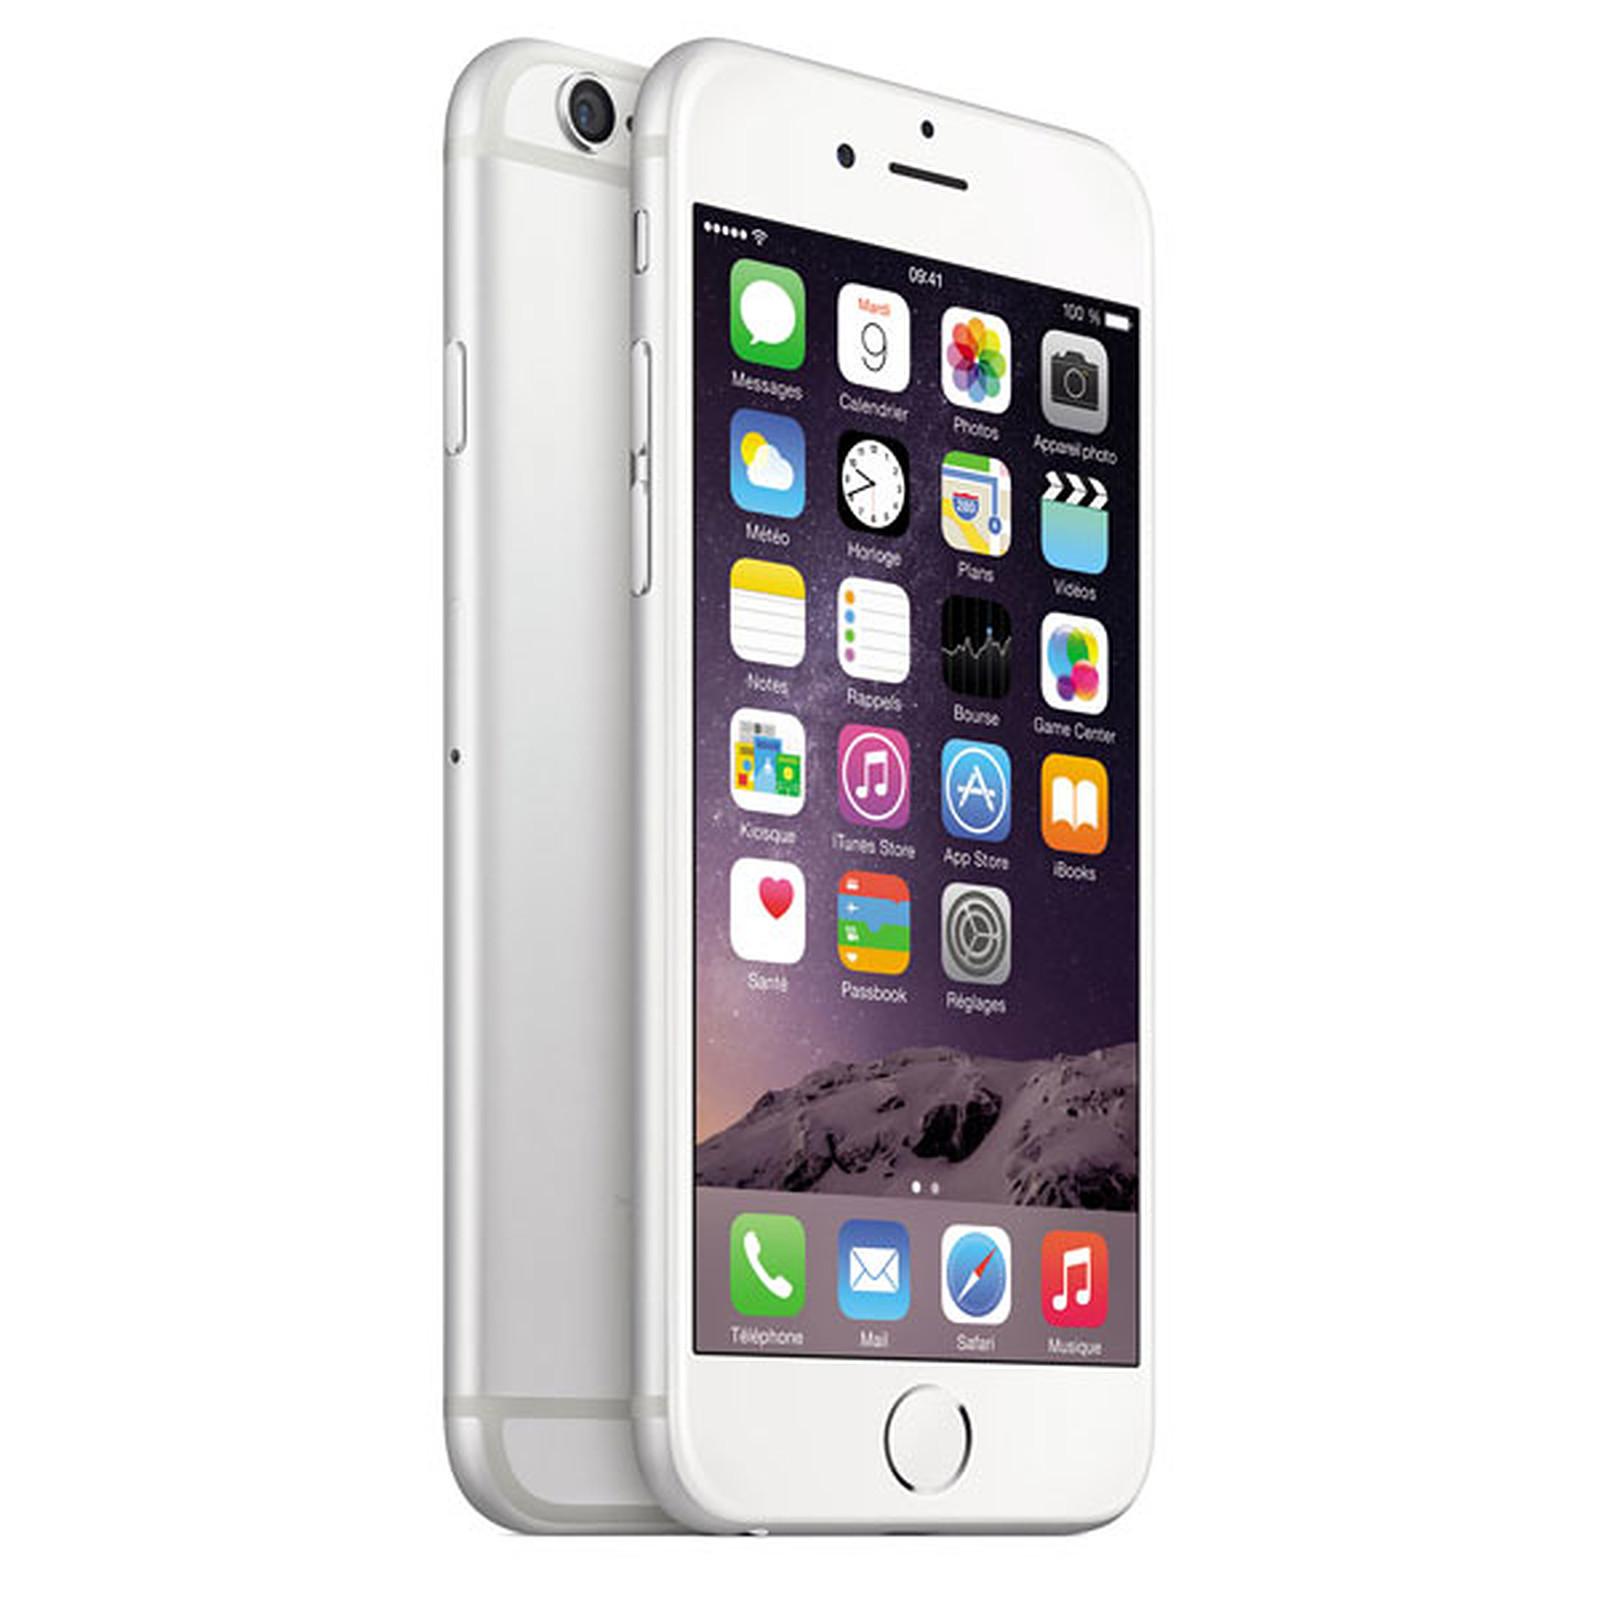 Remade iPhone 6 16 GB Silver (Grado A+)